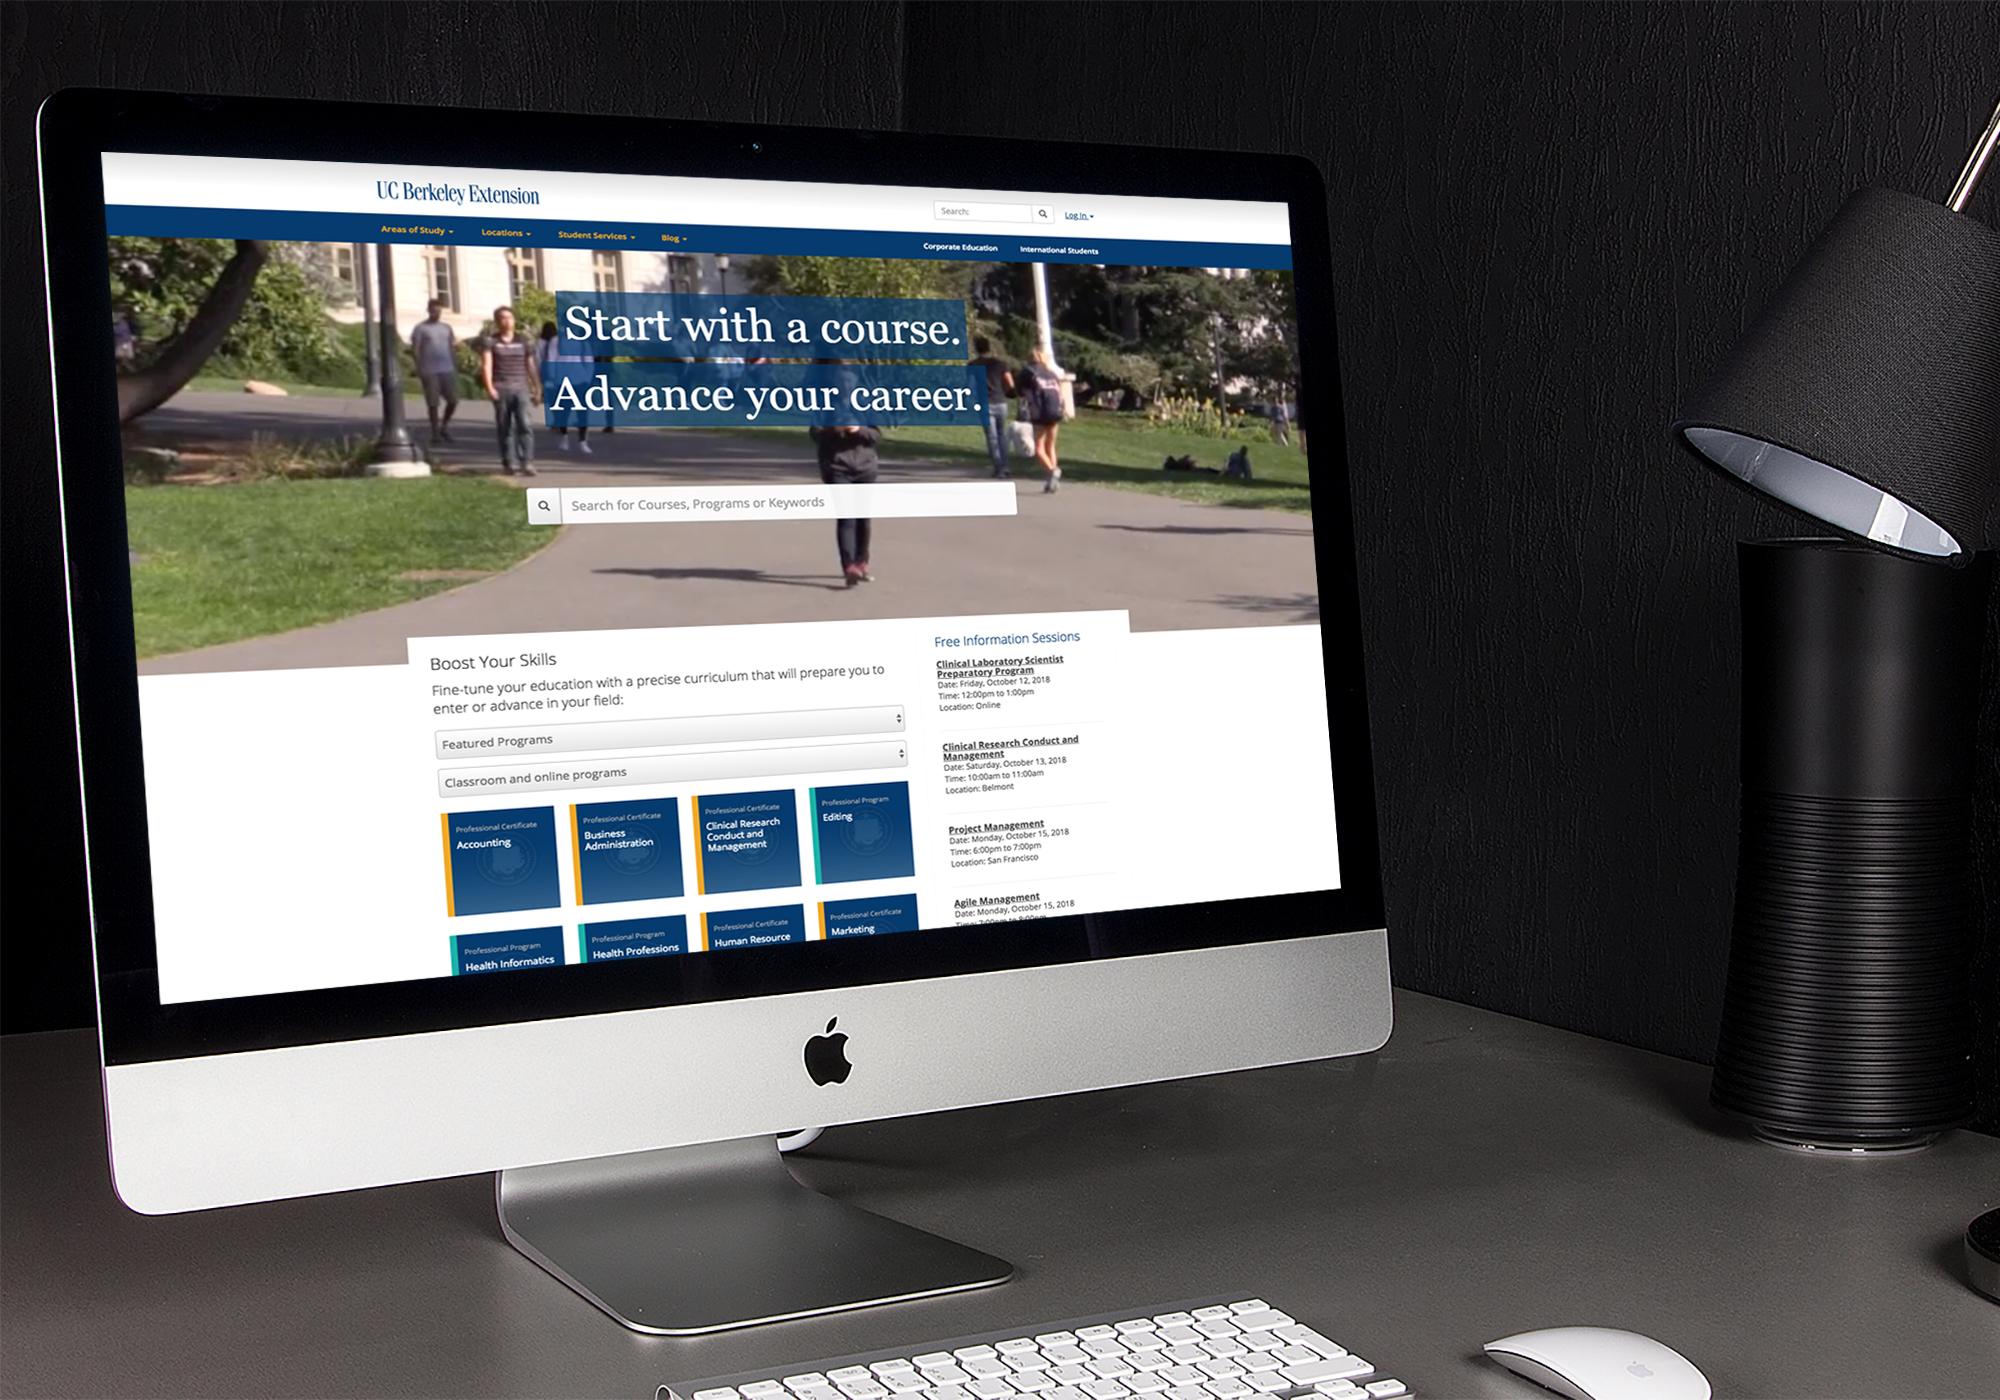 Extension homepage displayed on desktop computer